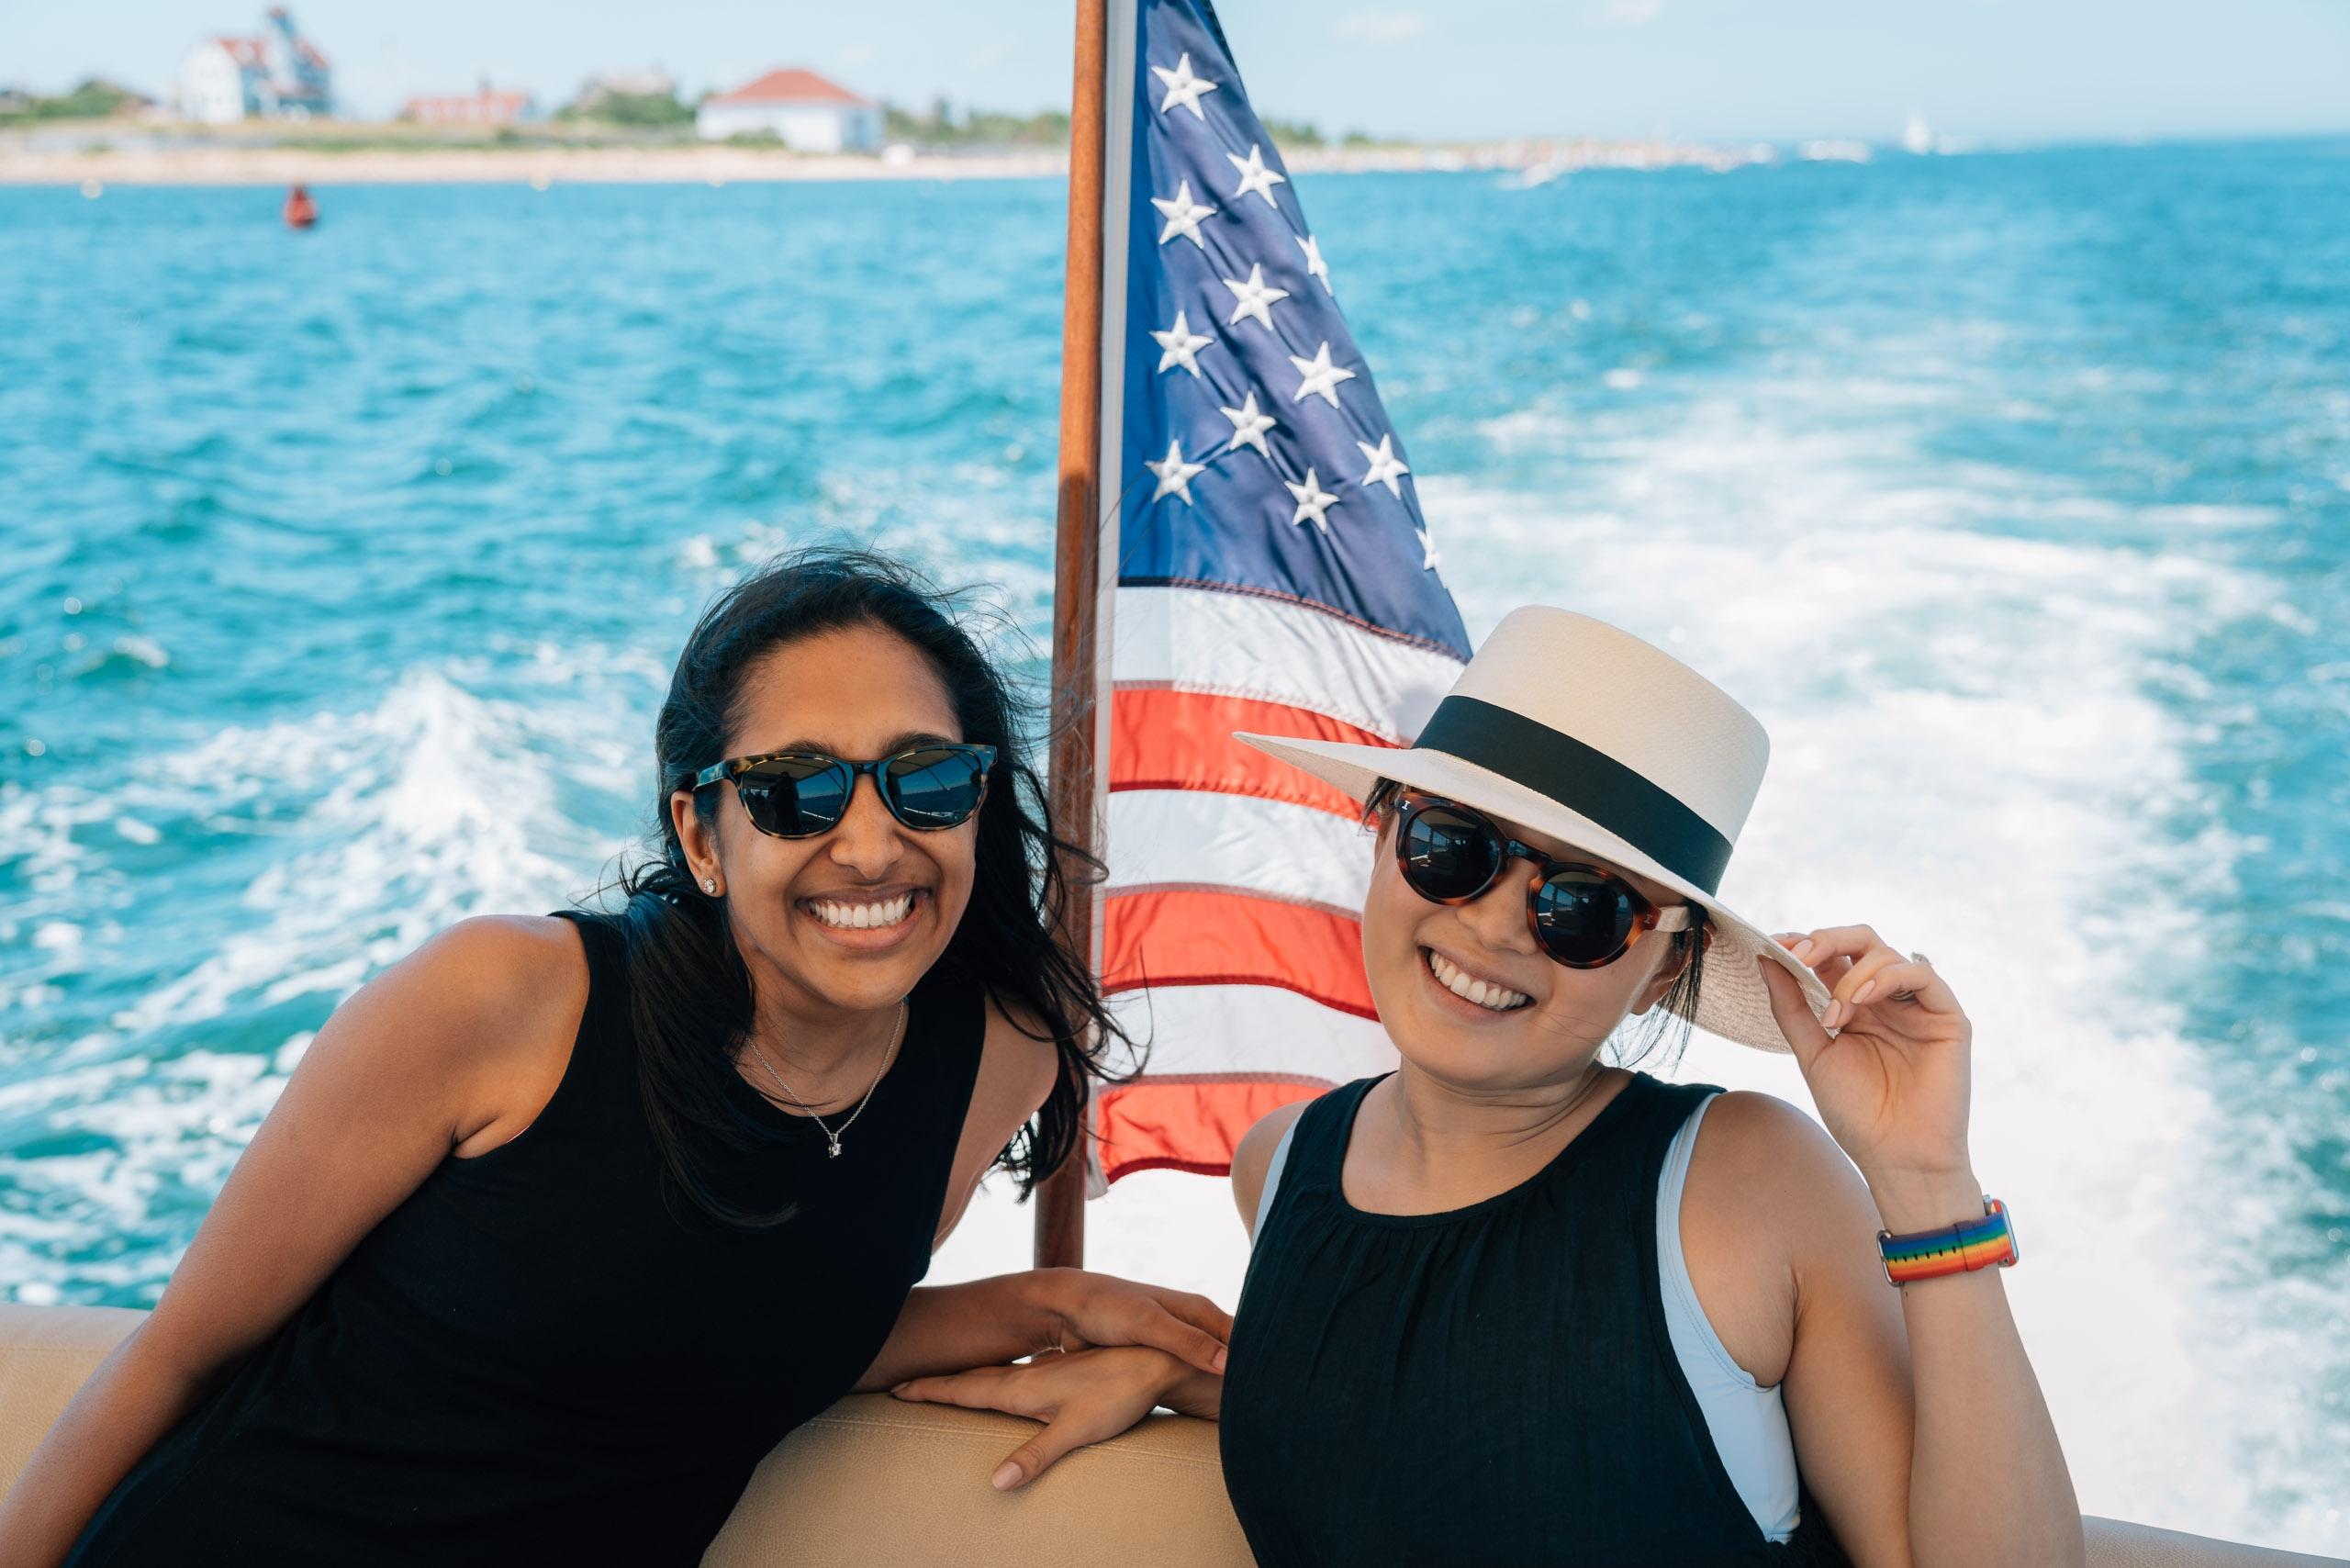 Ragini and Jessica on the Zoom